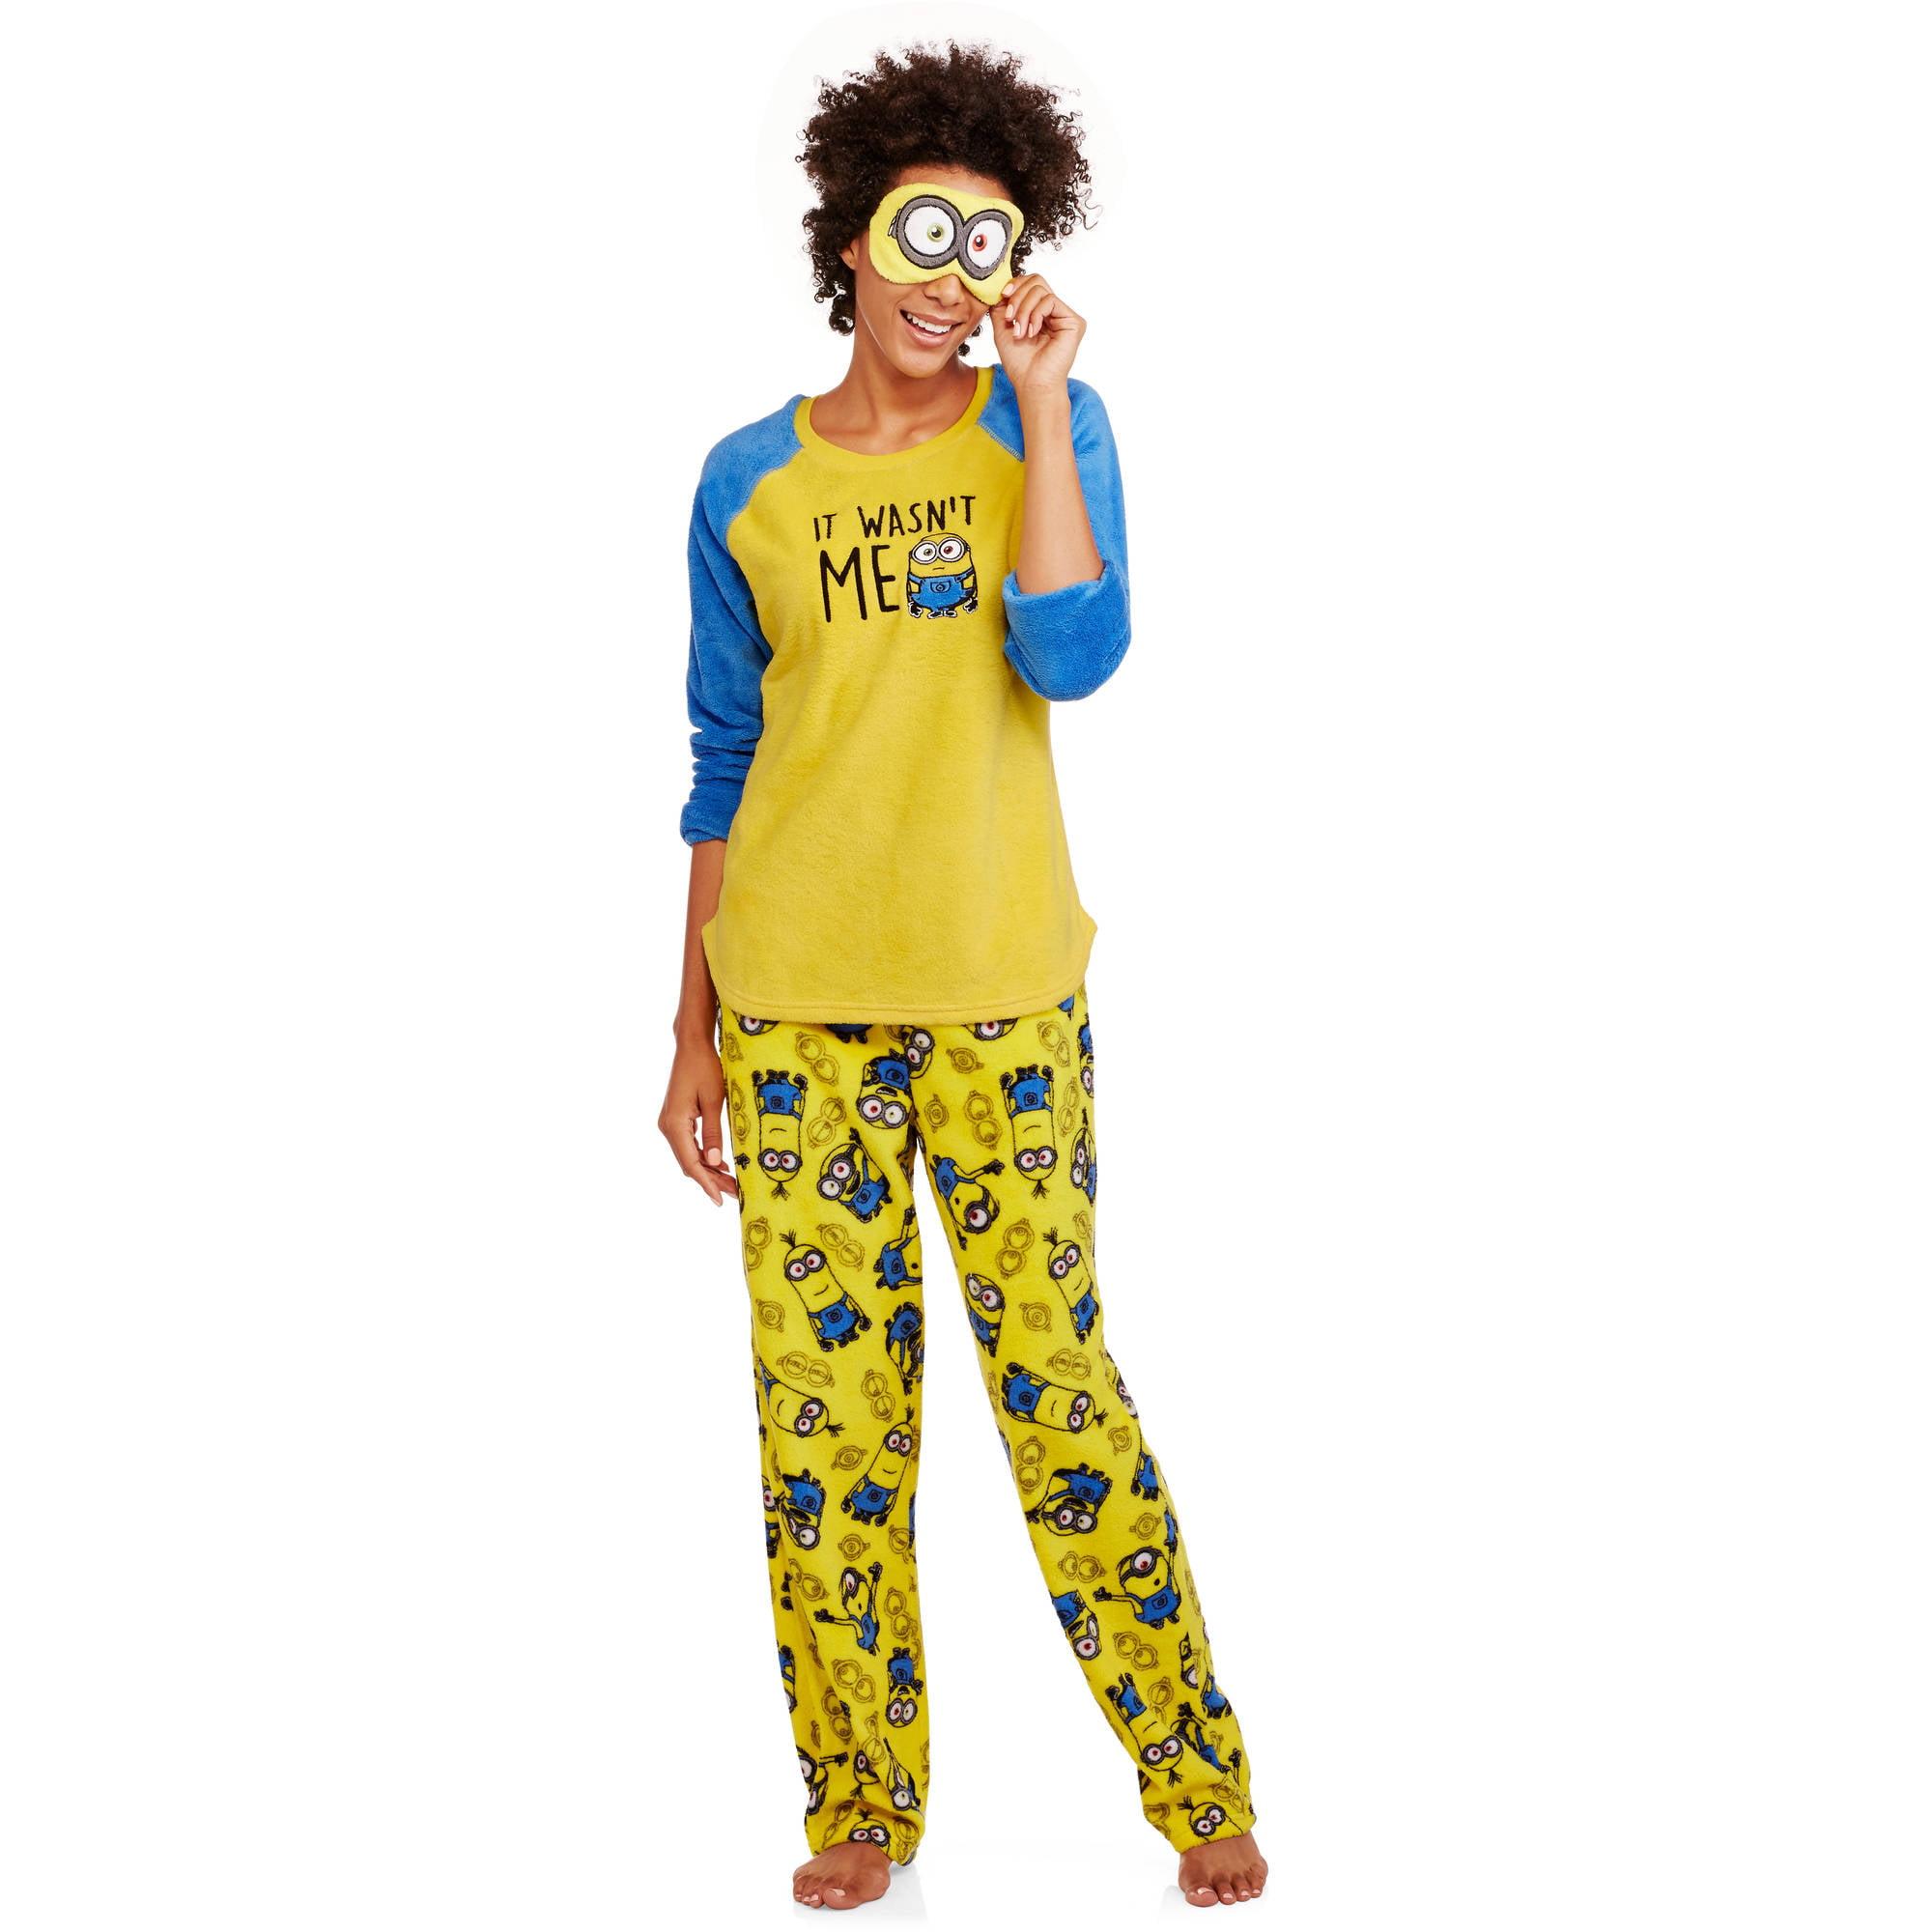 4958d71ec74d Despicable Me - Minions Women s License Pajama Plush Fleece Sleep Top and  Pant 2 Piece Giftable Sleepwear Set - Walmart.com